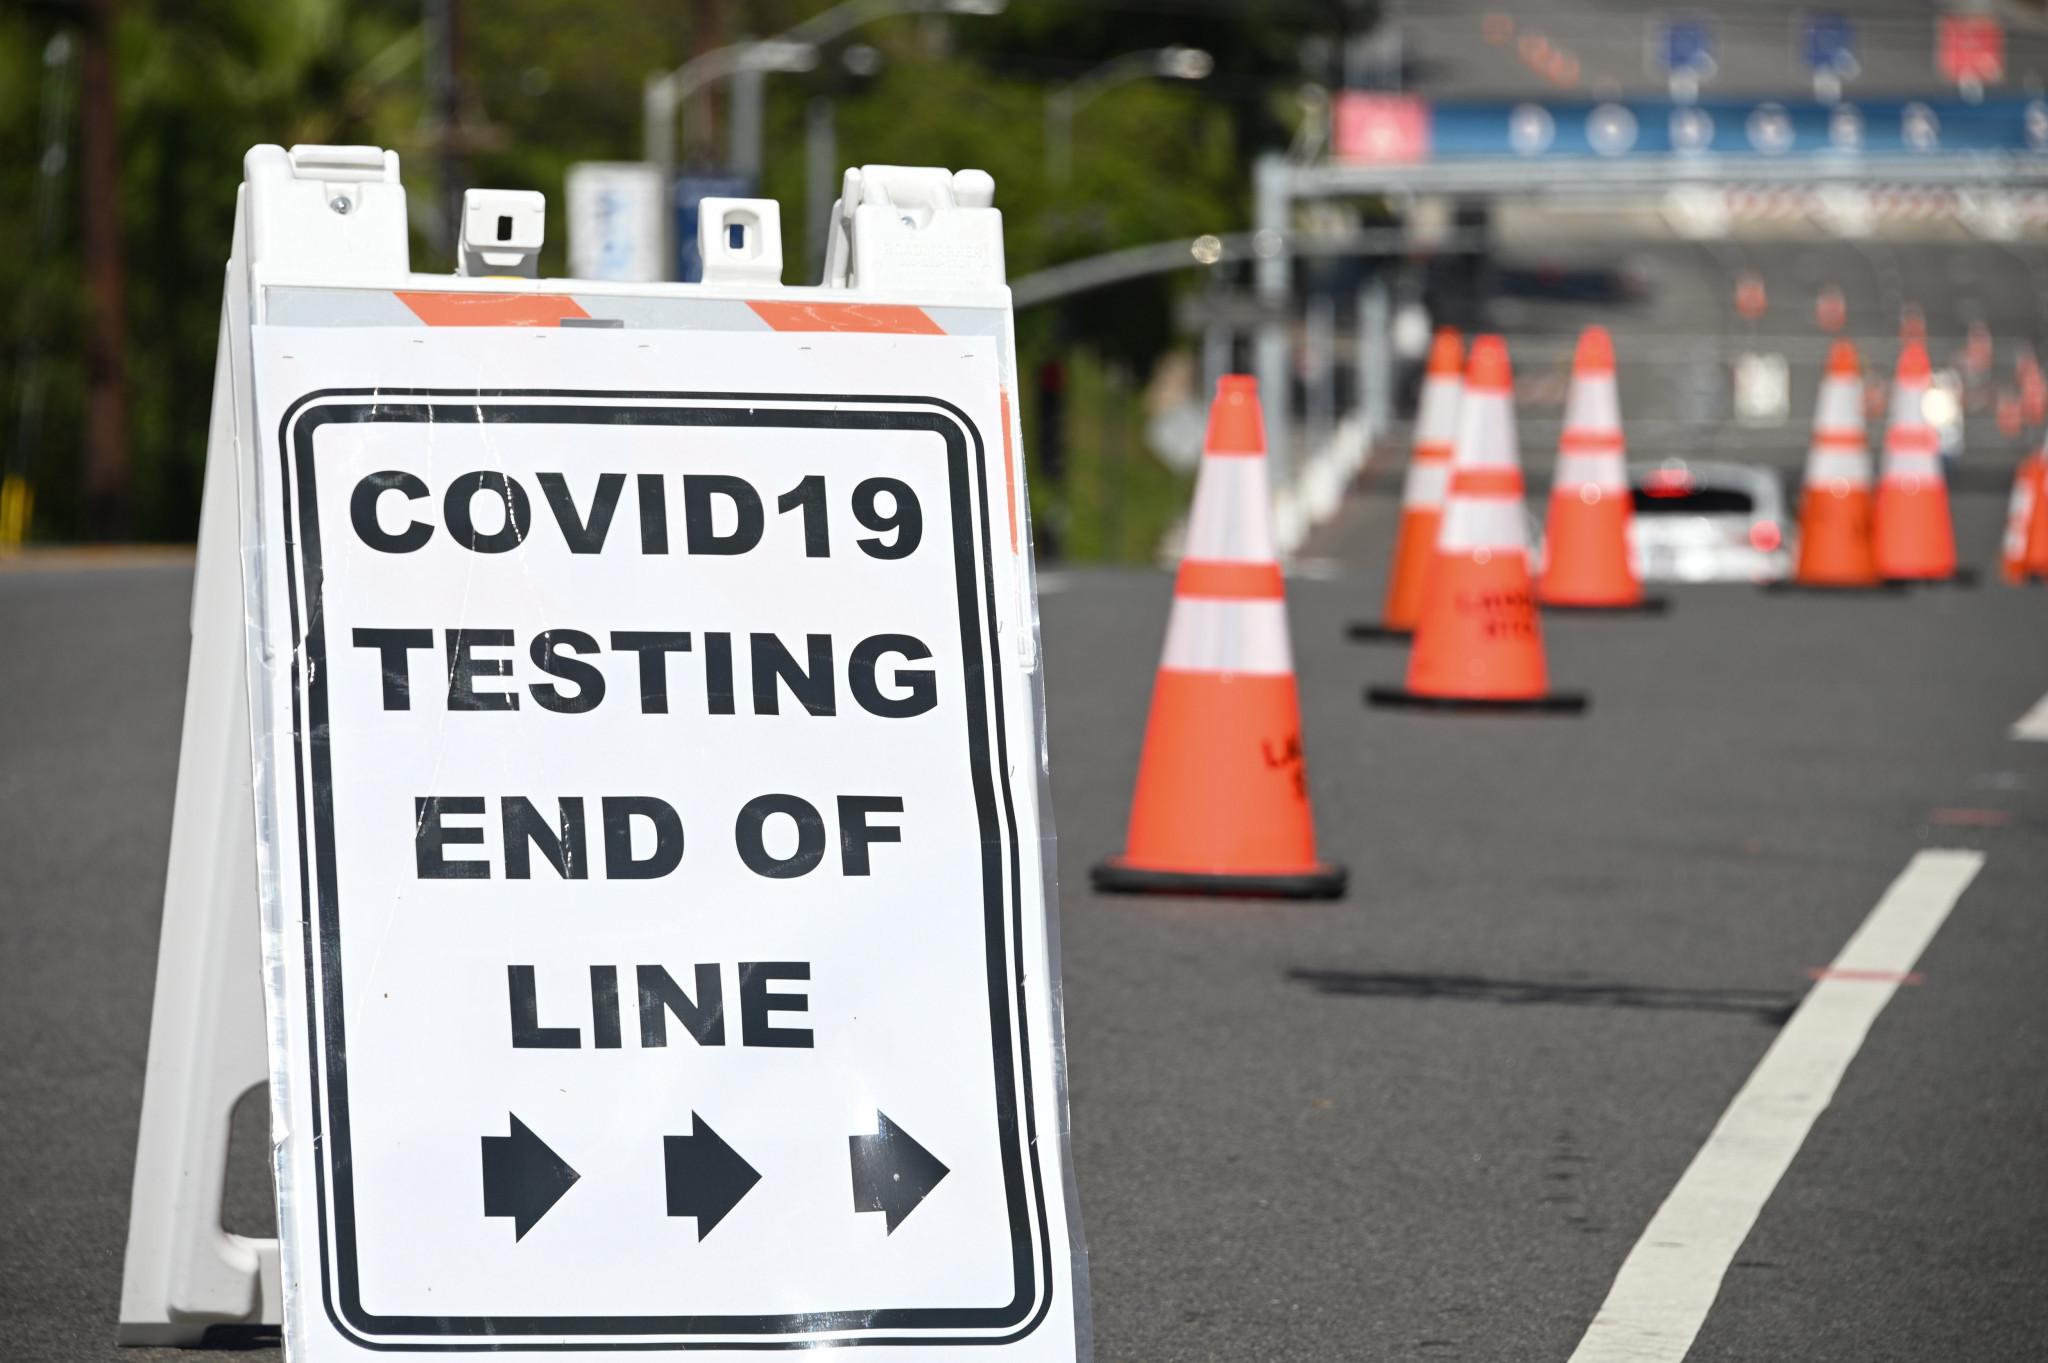 Athletes may undergo saliva COVID-19 testing every day at Tokyo 2020